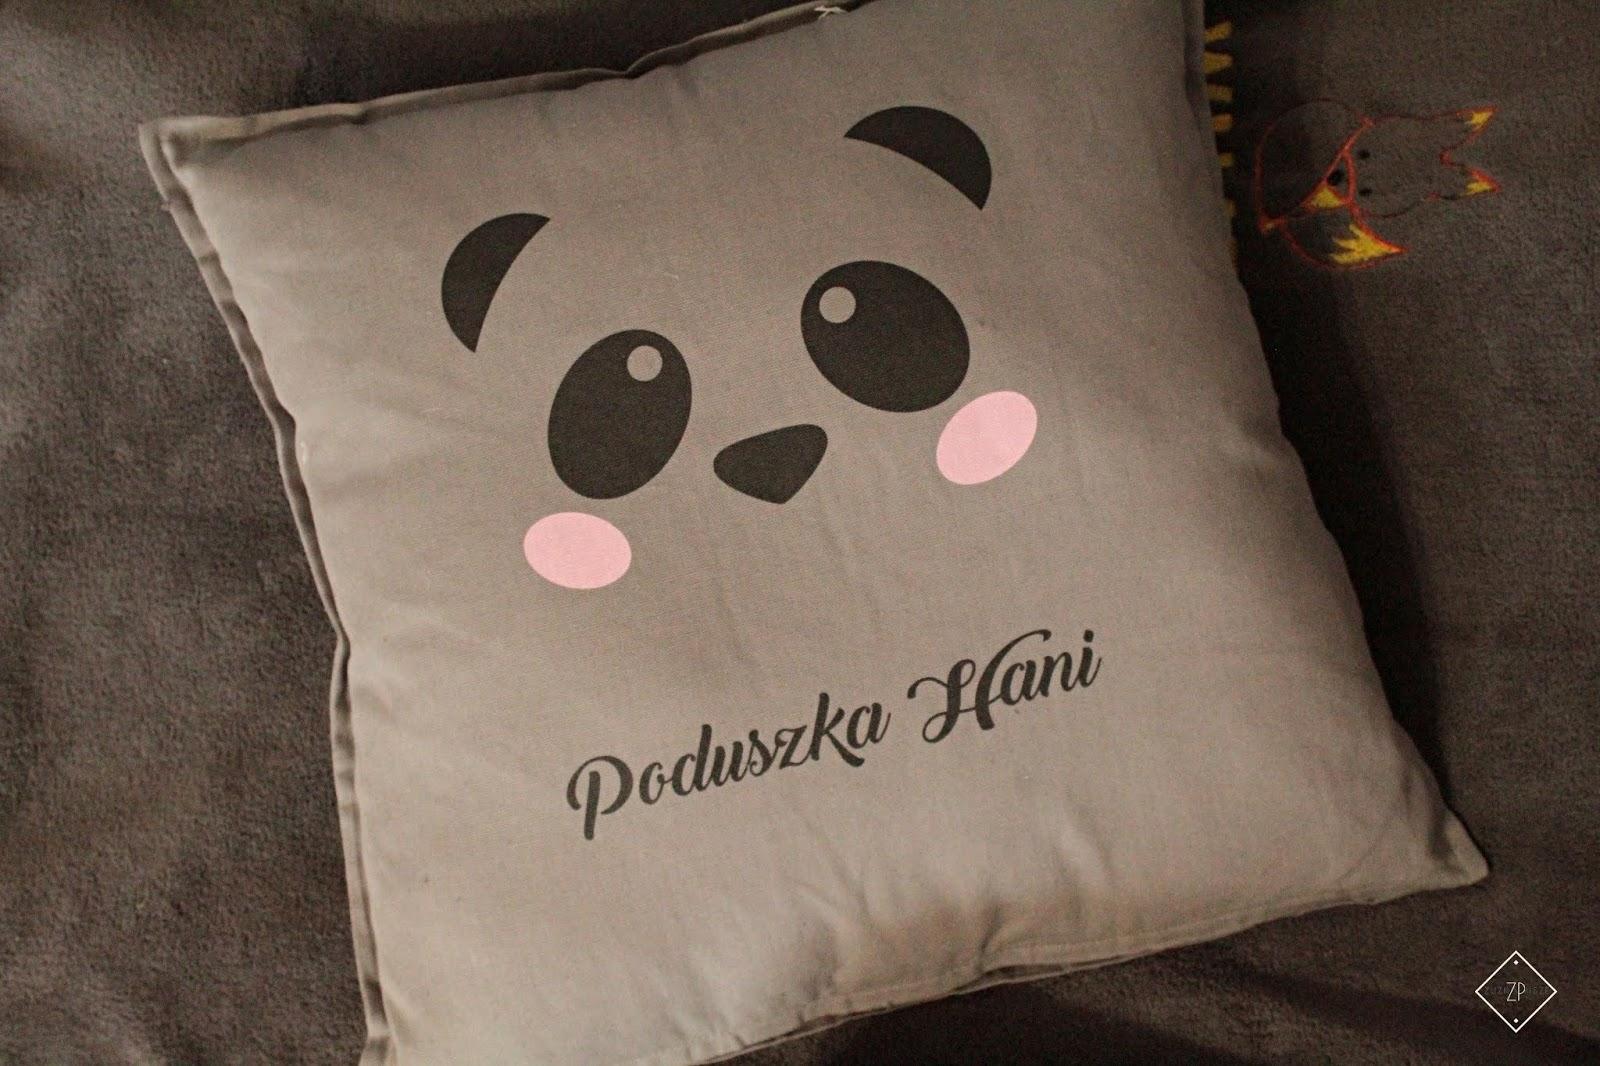 poduszka dekoracyjna panda mygiftdna